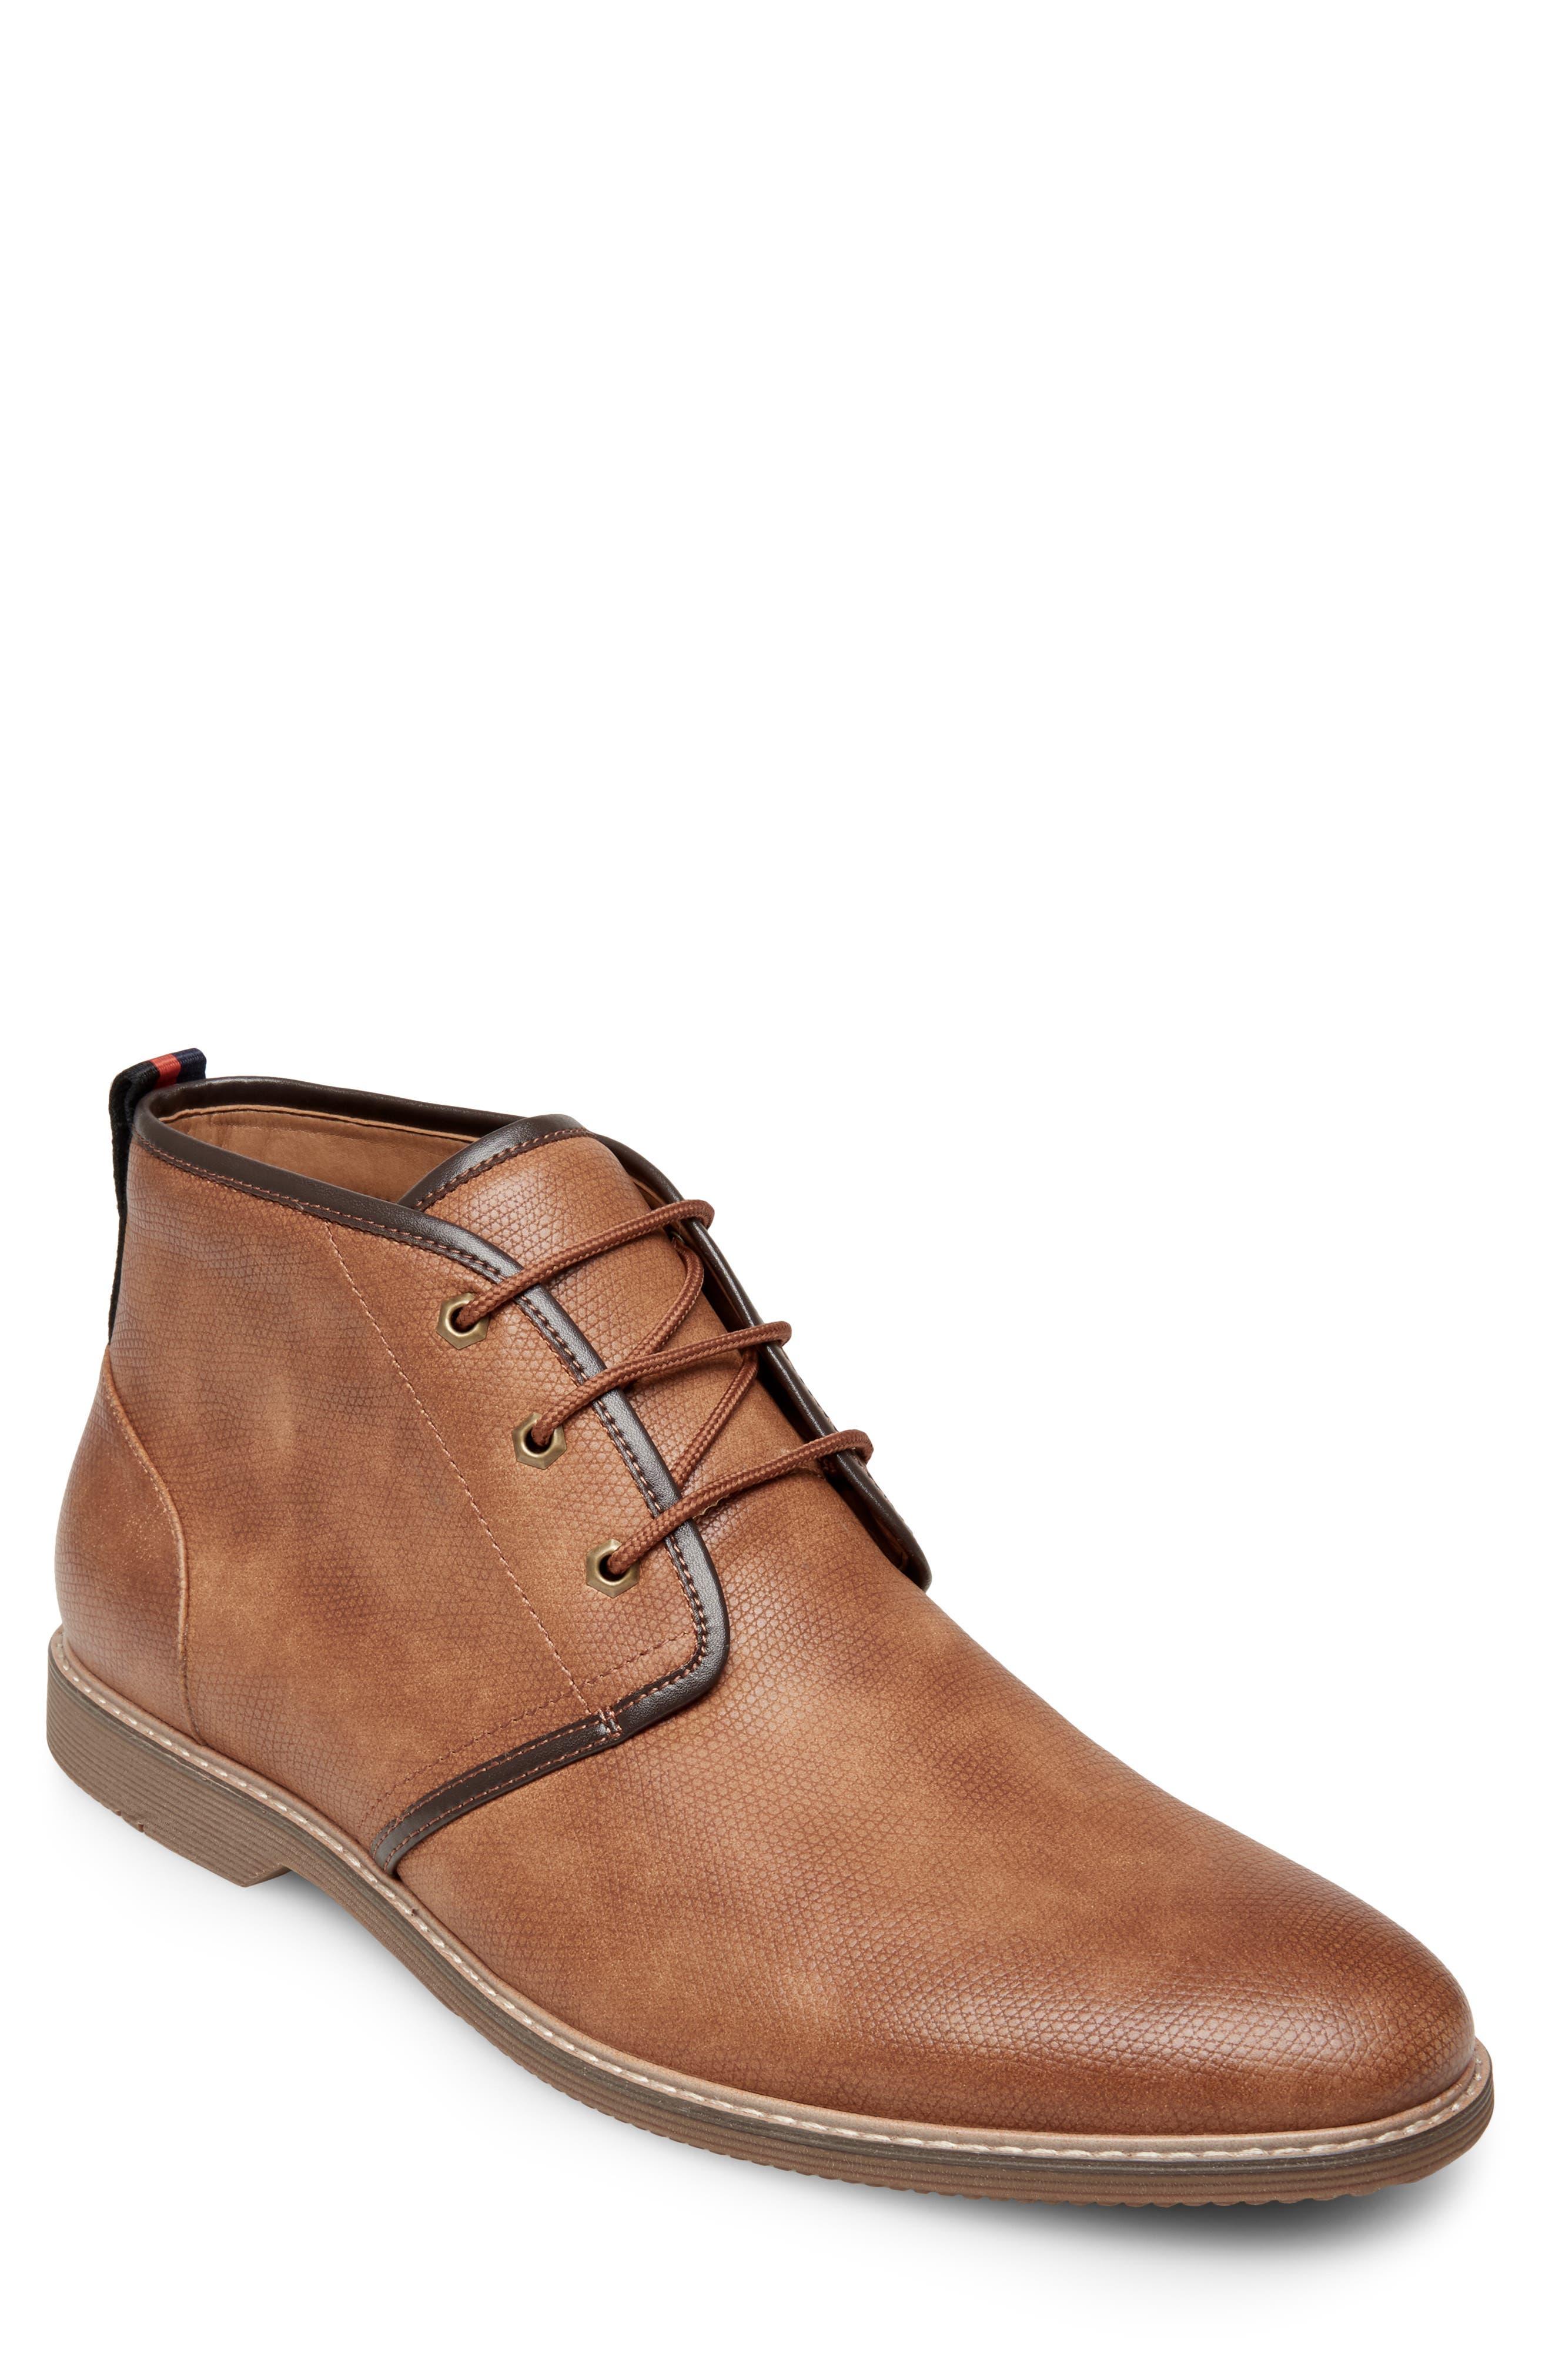 Nurture Plain Toe Boot,                             Main thumbnail 1, color,                             TAN LEATHER